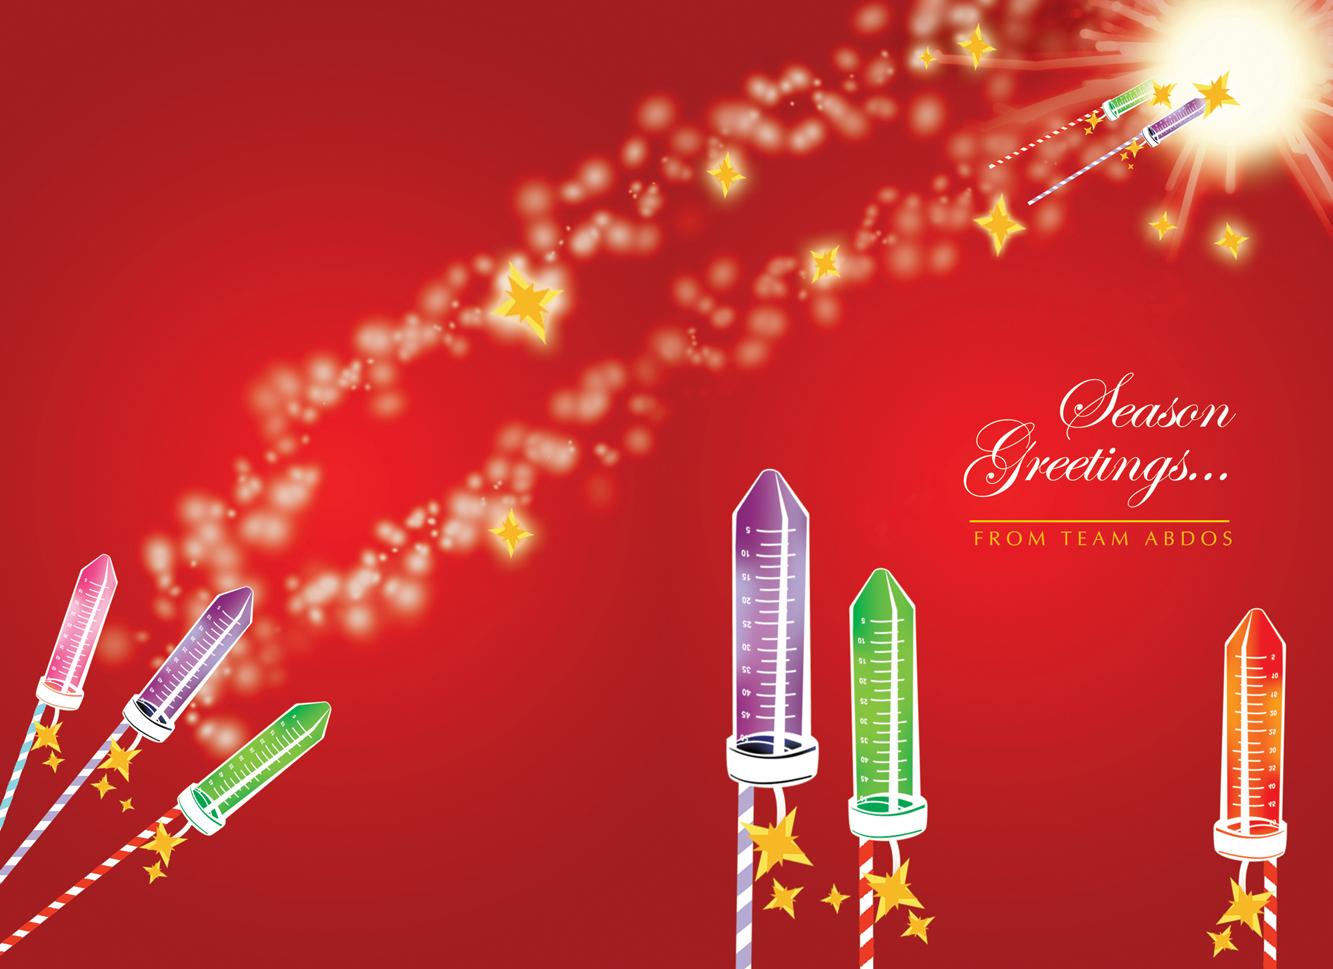 Arundesignport15 Abdos Diwali Greetings